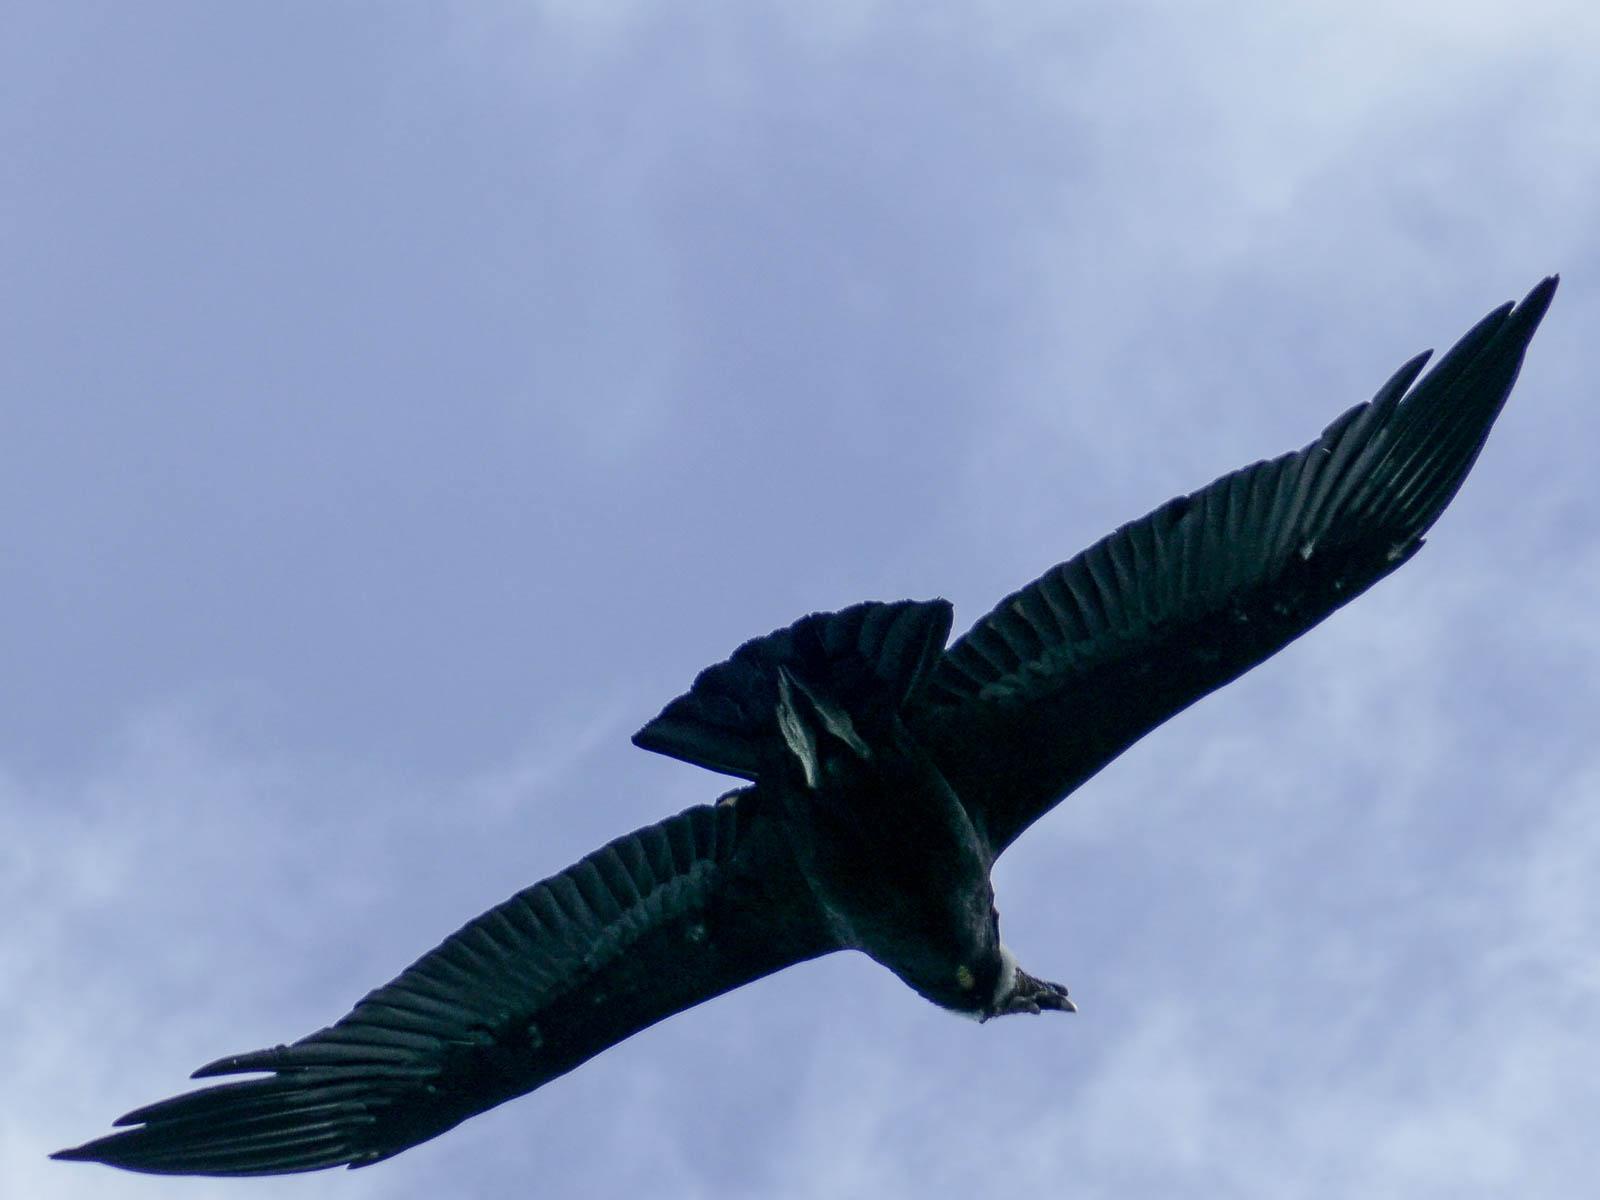 Soaring condor at Perito Moreno Glacier